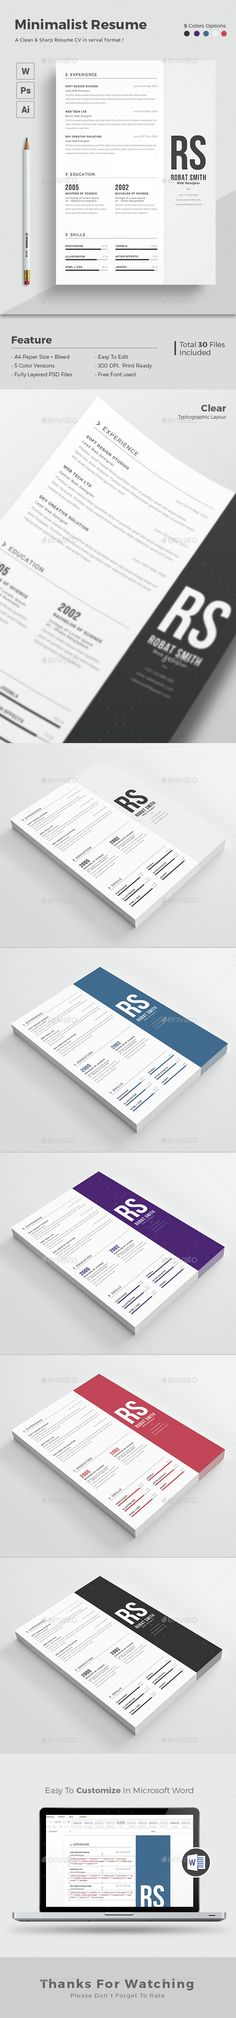 Minimalist Resume Template PSD, Vector EPS, AI. Download here: http://graphicriver.net/item/minimalist-resume/14631931?ref=ksioks